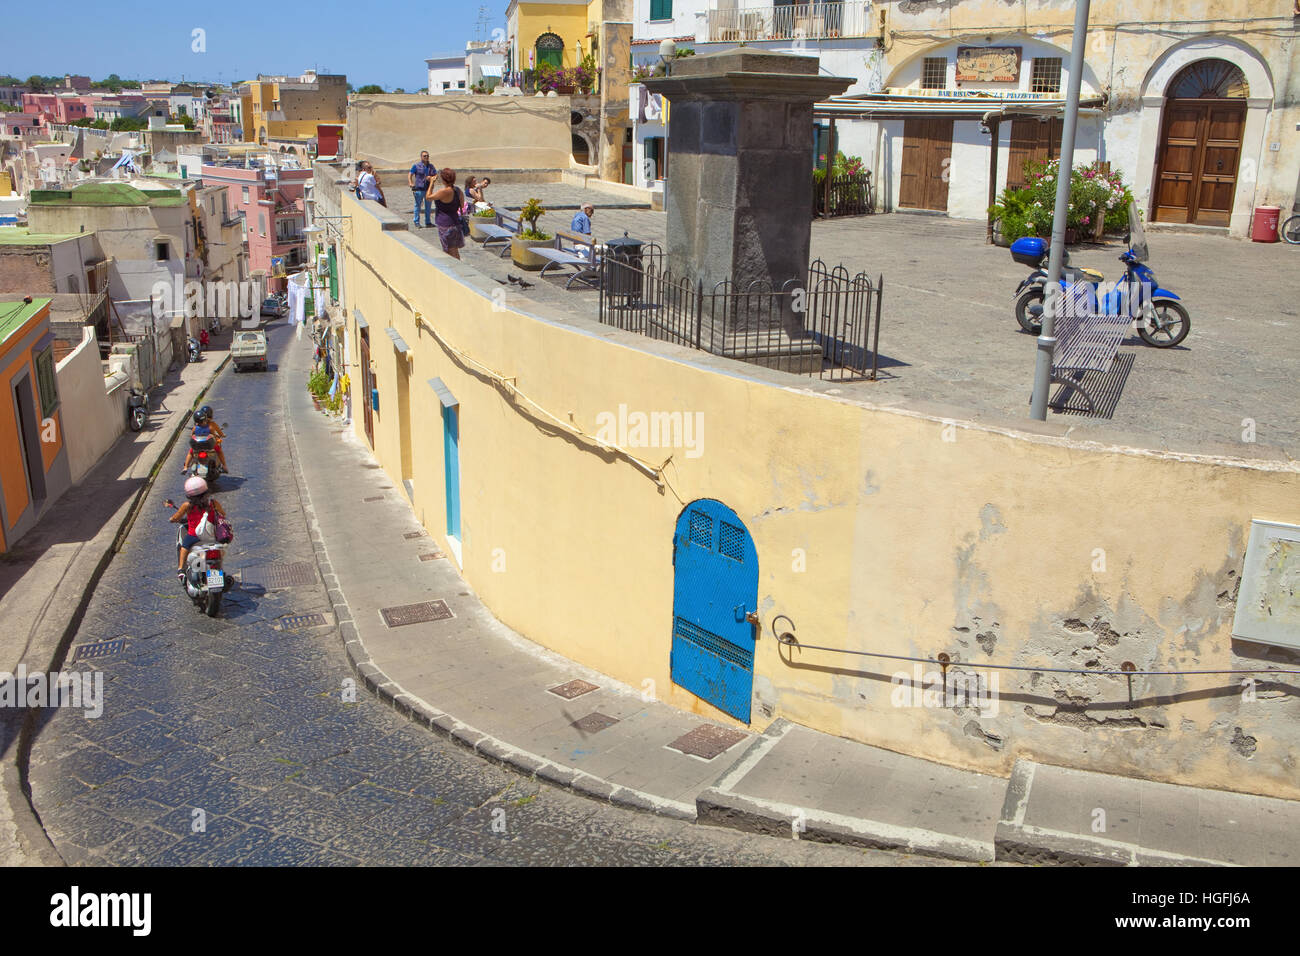 Italy, Gulf of Naples, Procida island - Piazzetta. - Stock Image